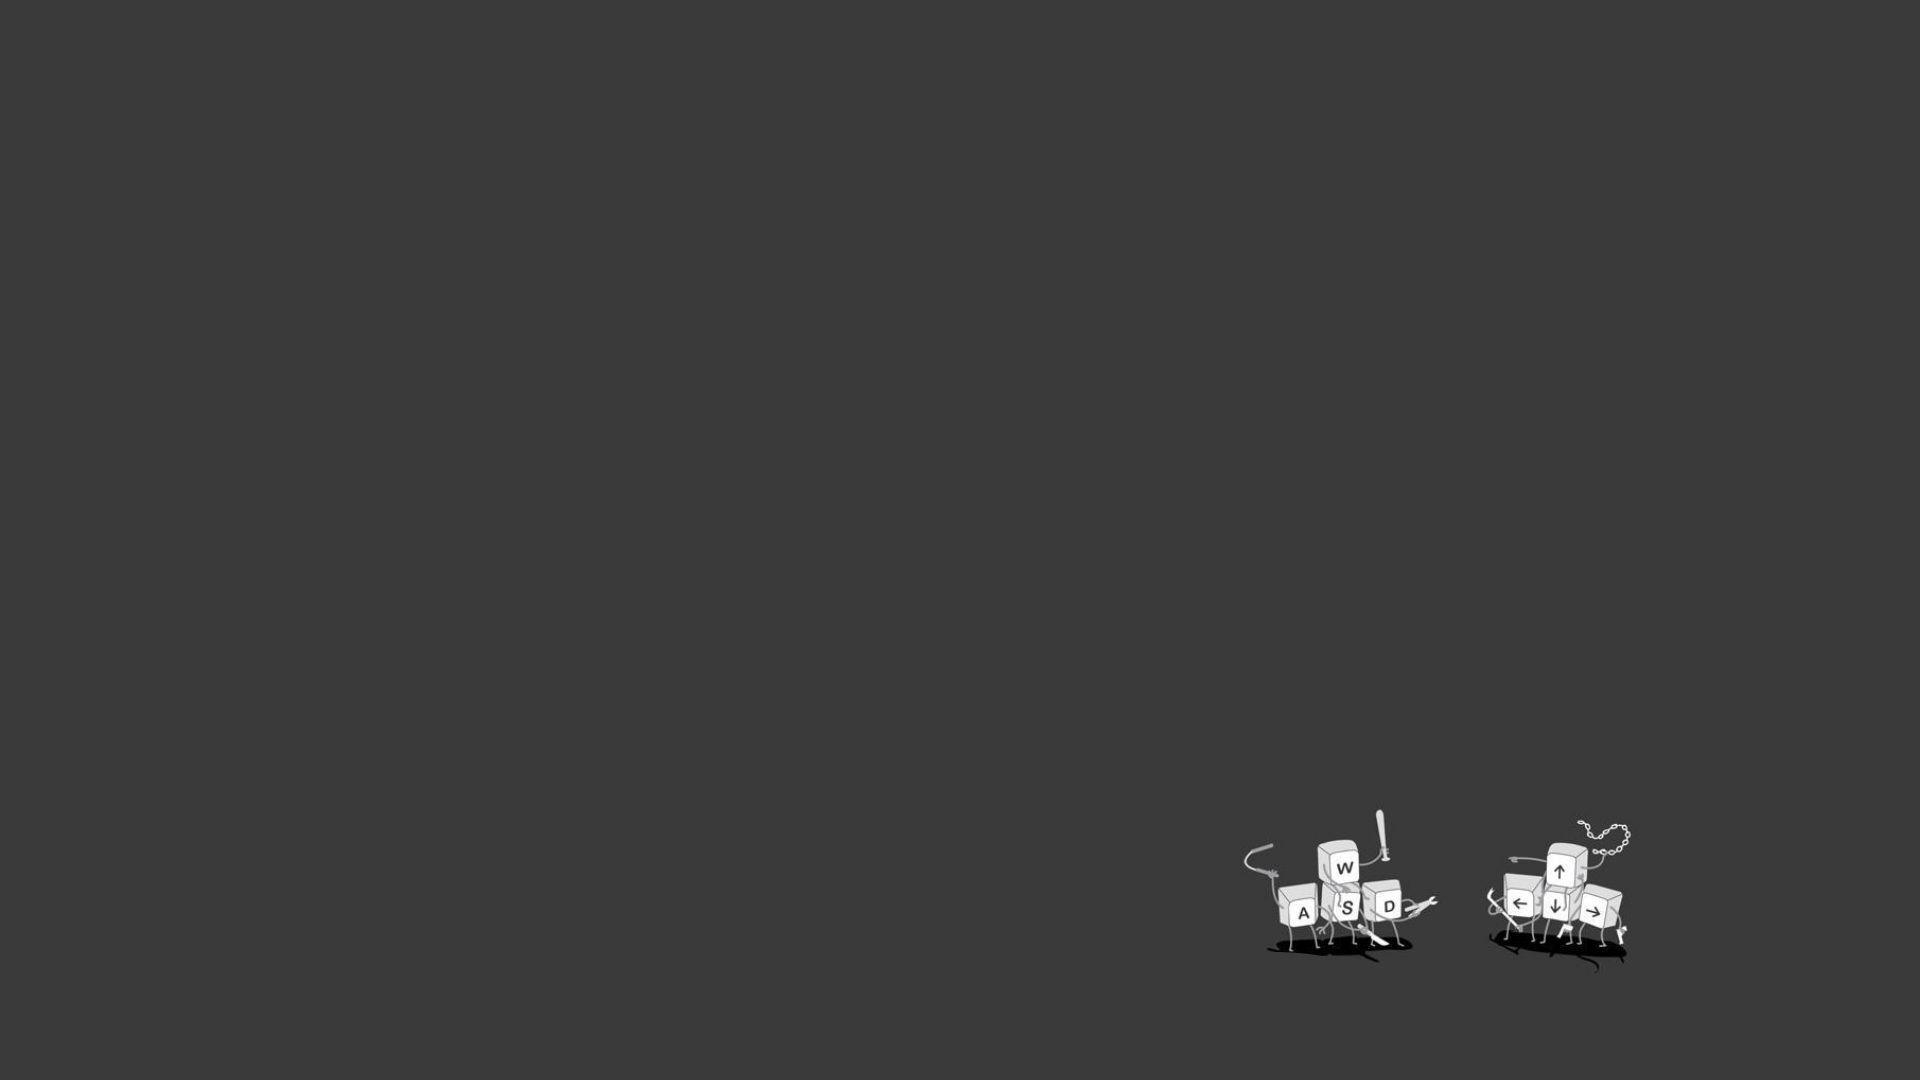 Funny Simple Desktop Wallpapers Top Free Funny Simple Desktop Backgrounds Wallpaperaccess